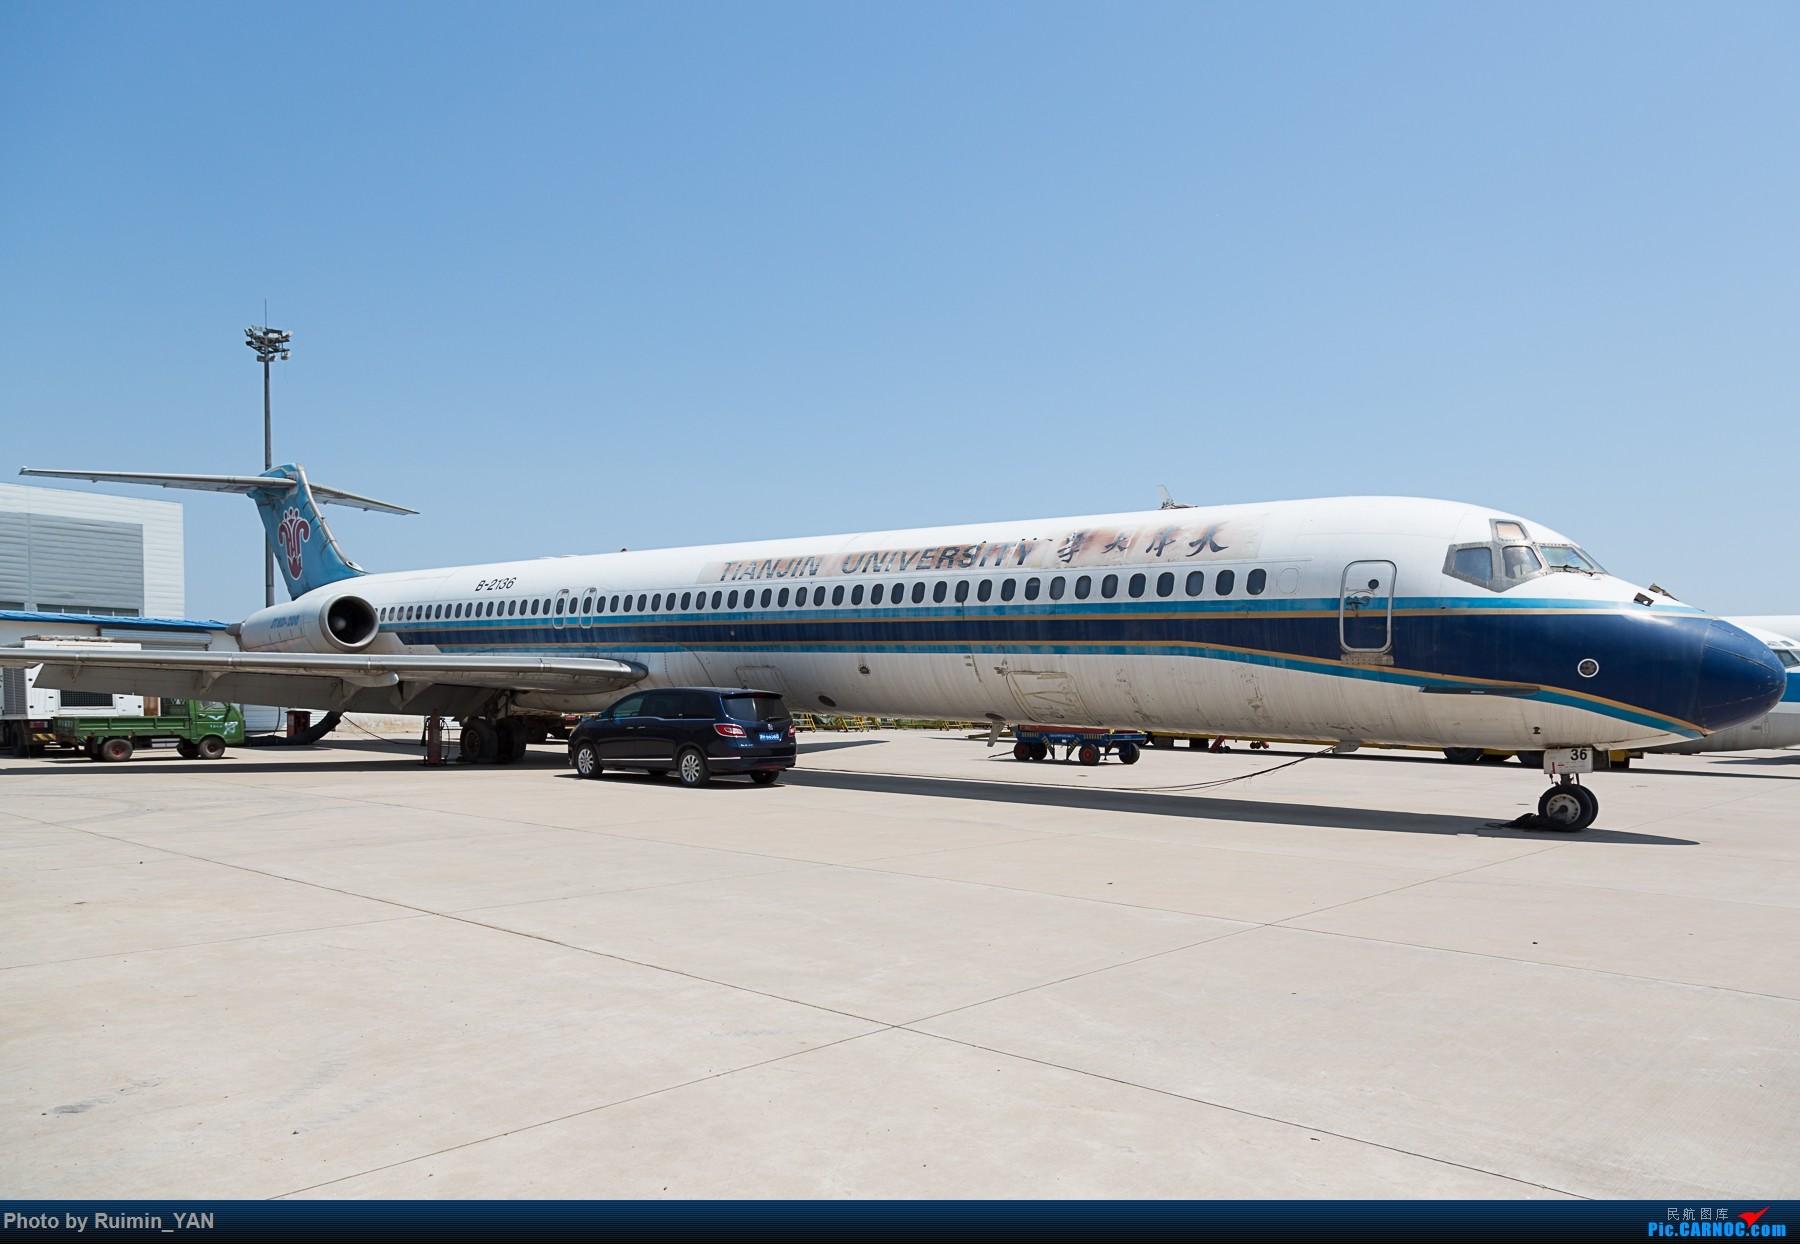 Re:[原创]【民航大学】天津大学(Tianjin University) 中国南方航空(CZ) B-2136, 麦道MD82 MD MD-80 B-2136 中国天津滨海国际机场